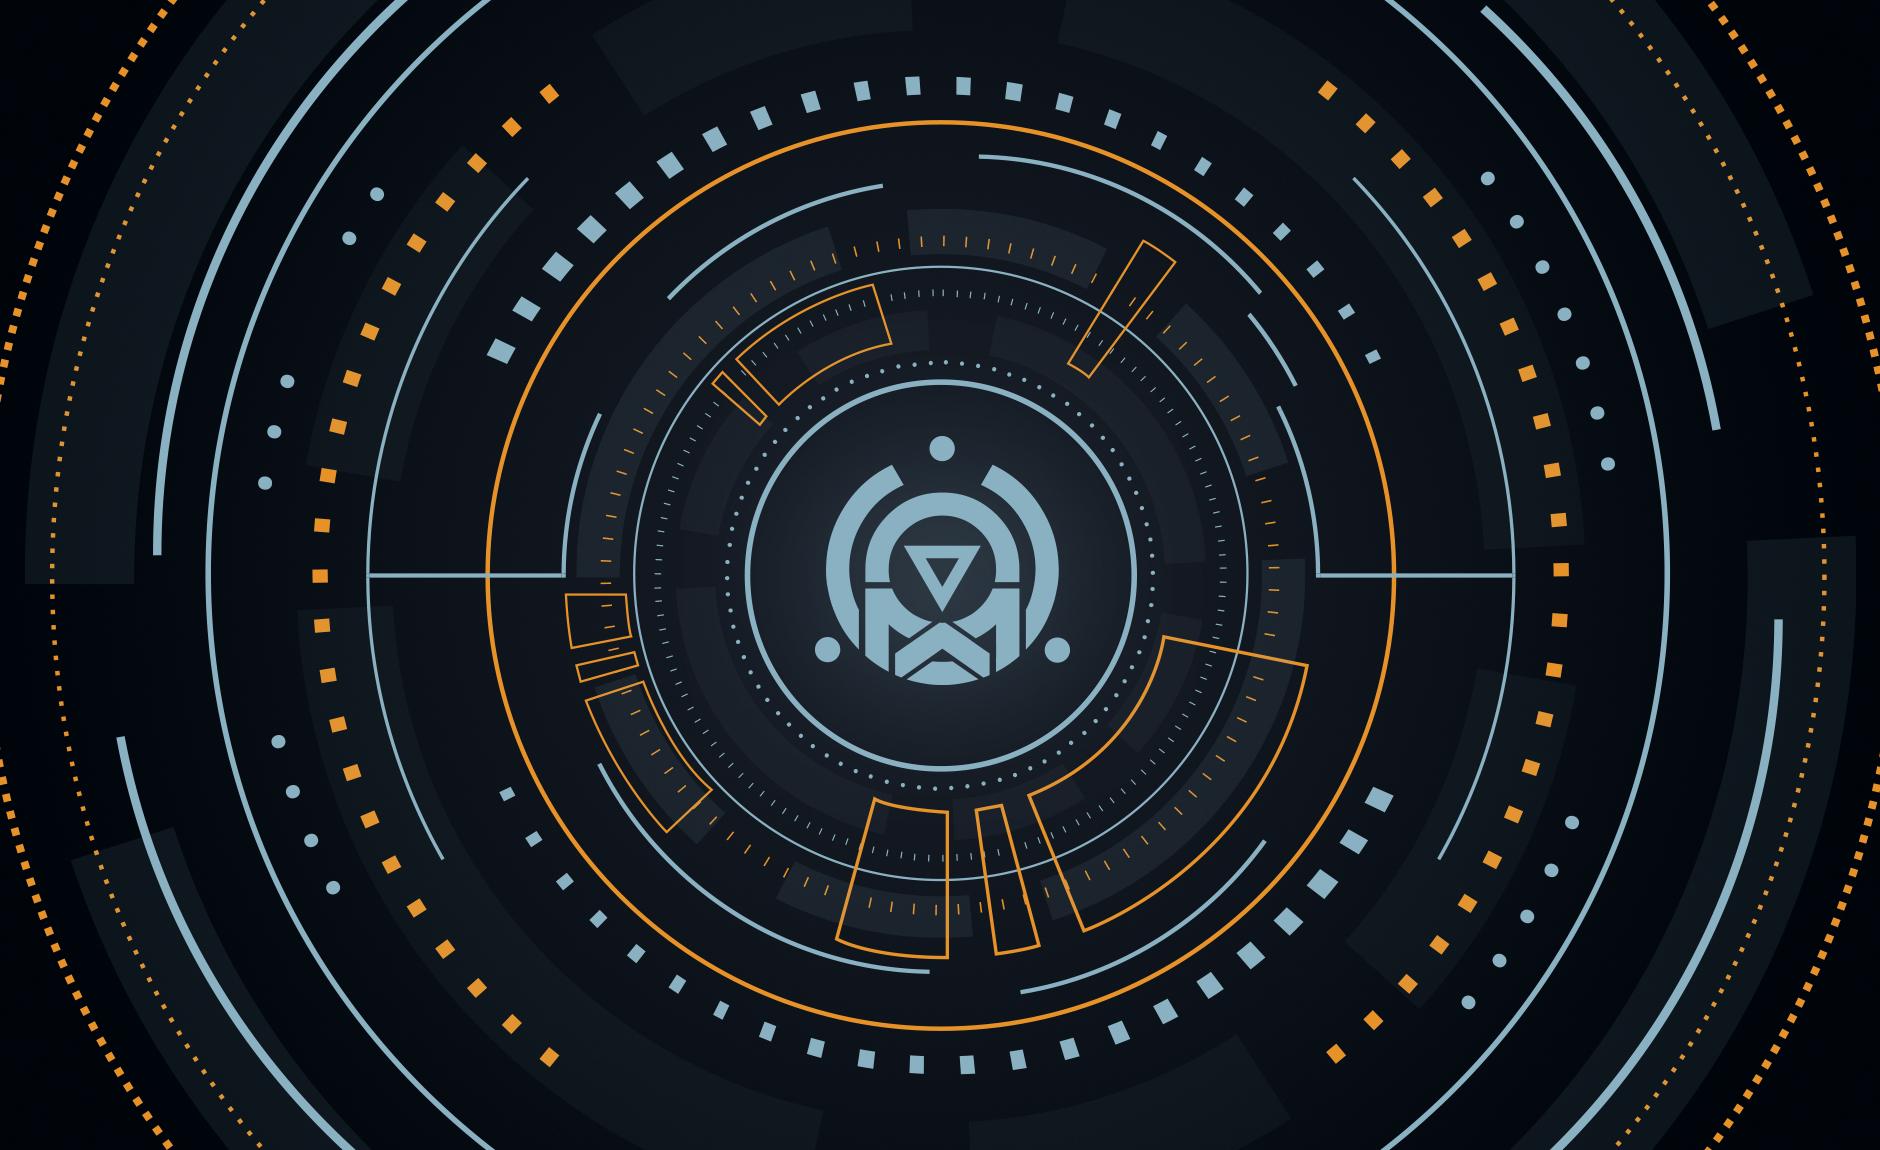 Cyber tech wallpaper by rodolforamirez on deviantart - Cyber wallpaper ...